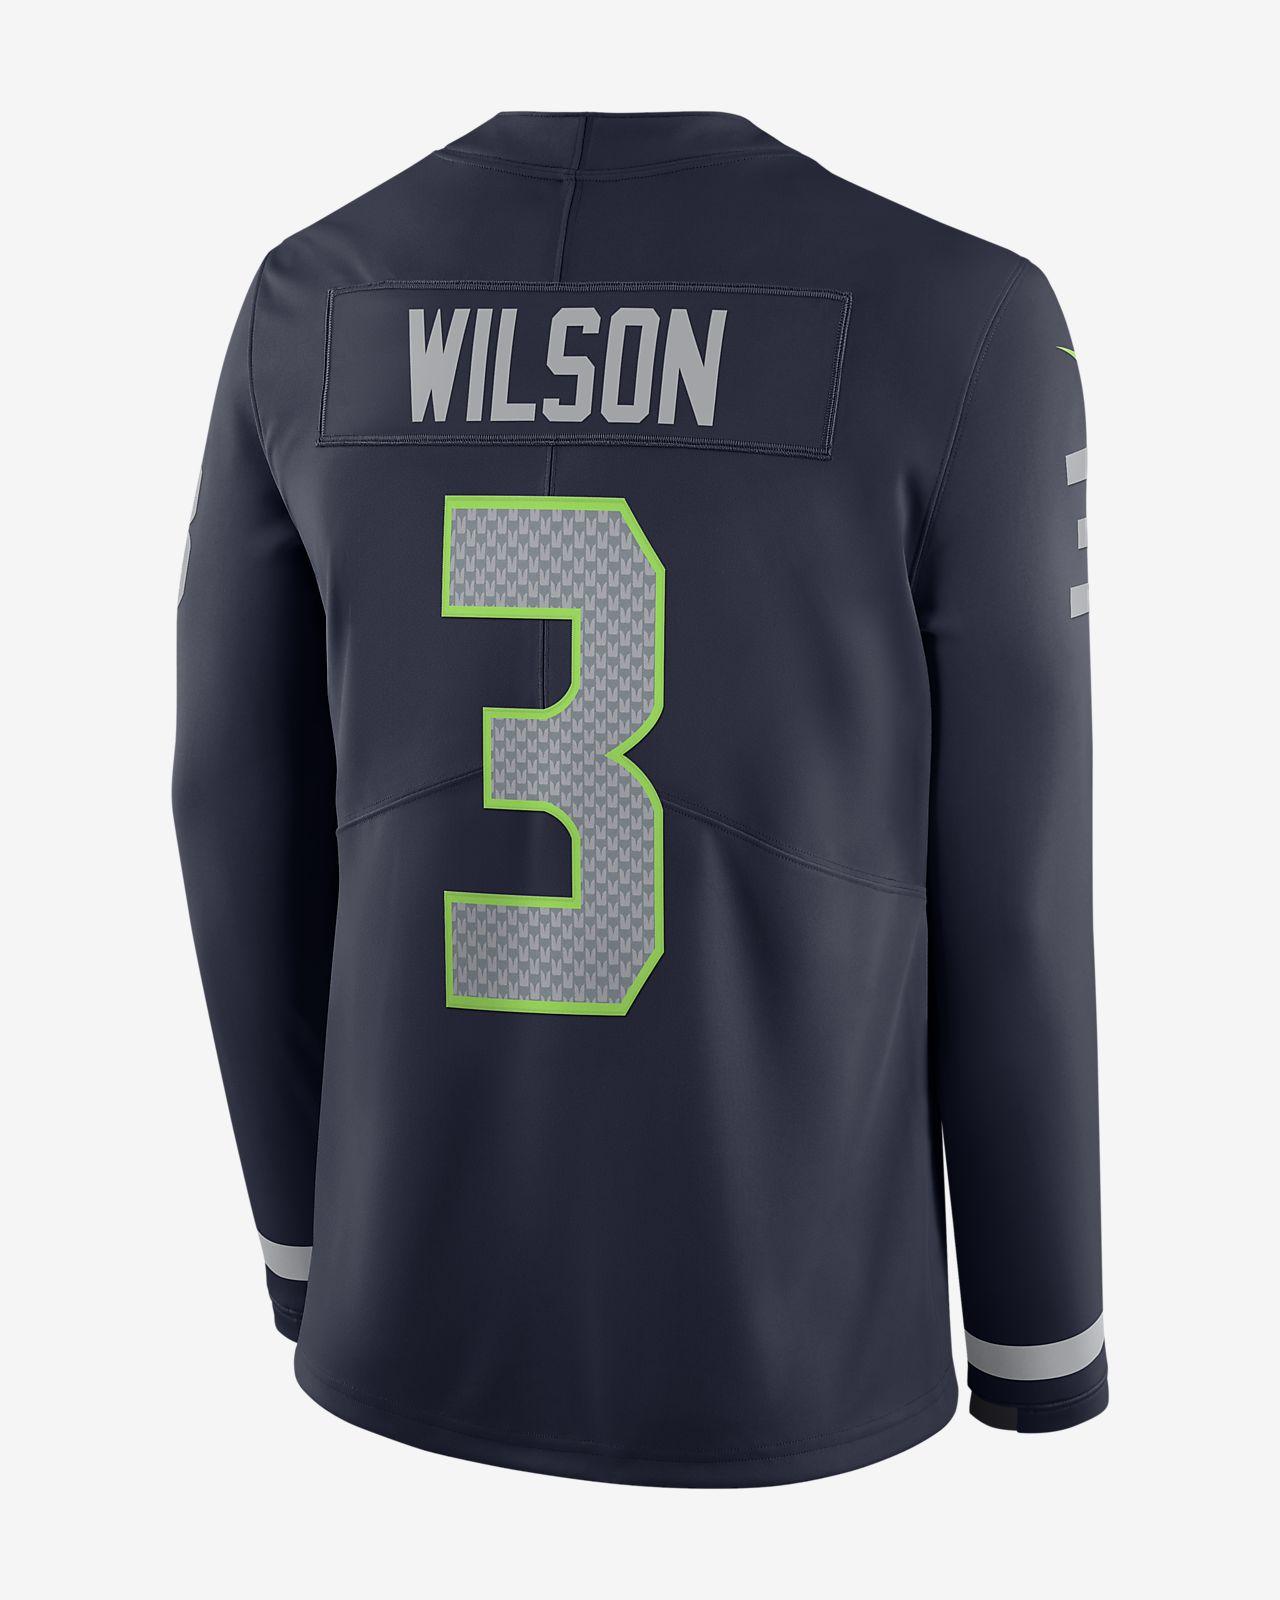 4014bca575d ... NFL Seattle Seahawks Jersey (Russell Wilson) Men's Long-Sleeve Football  Jersey